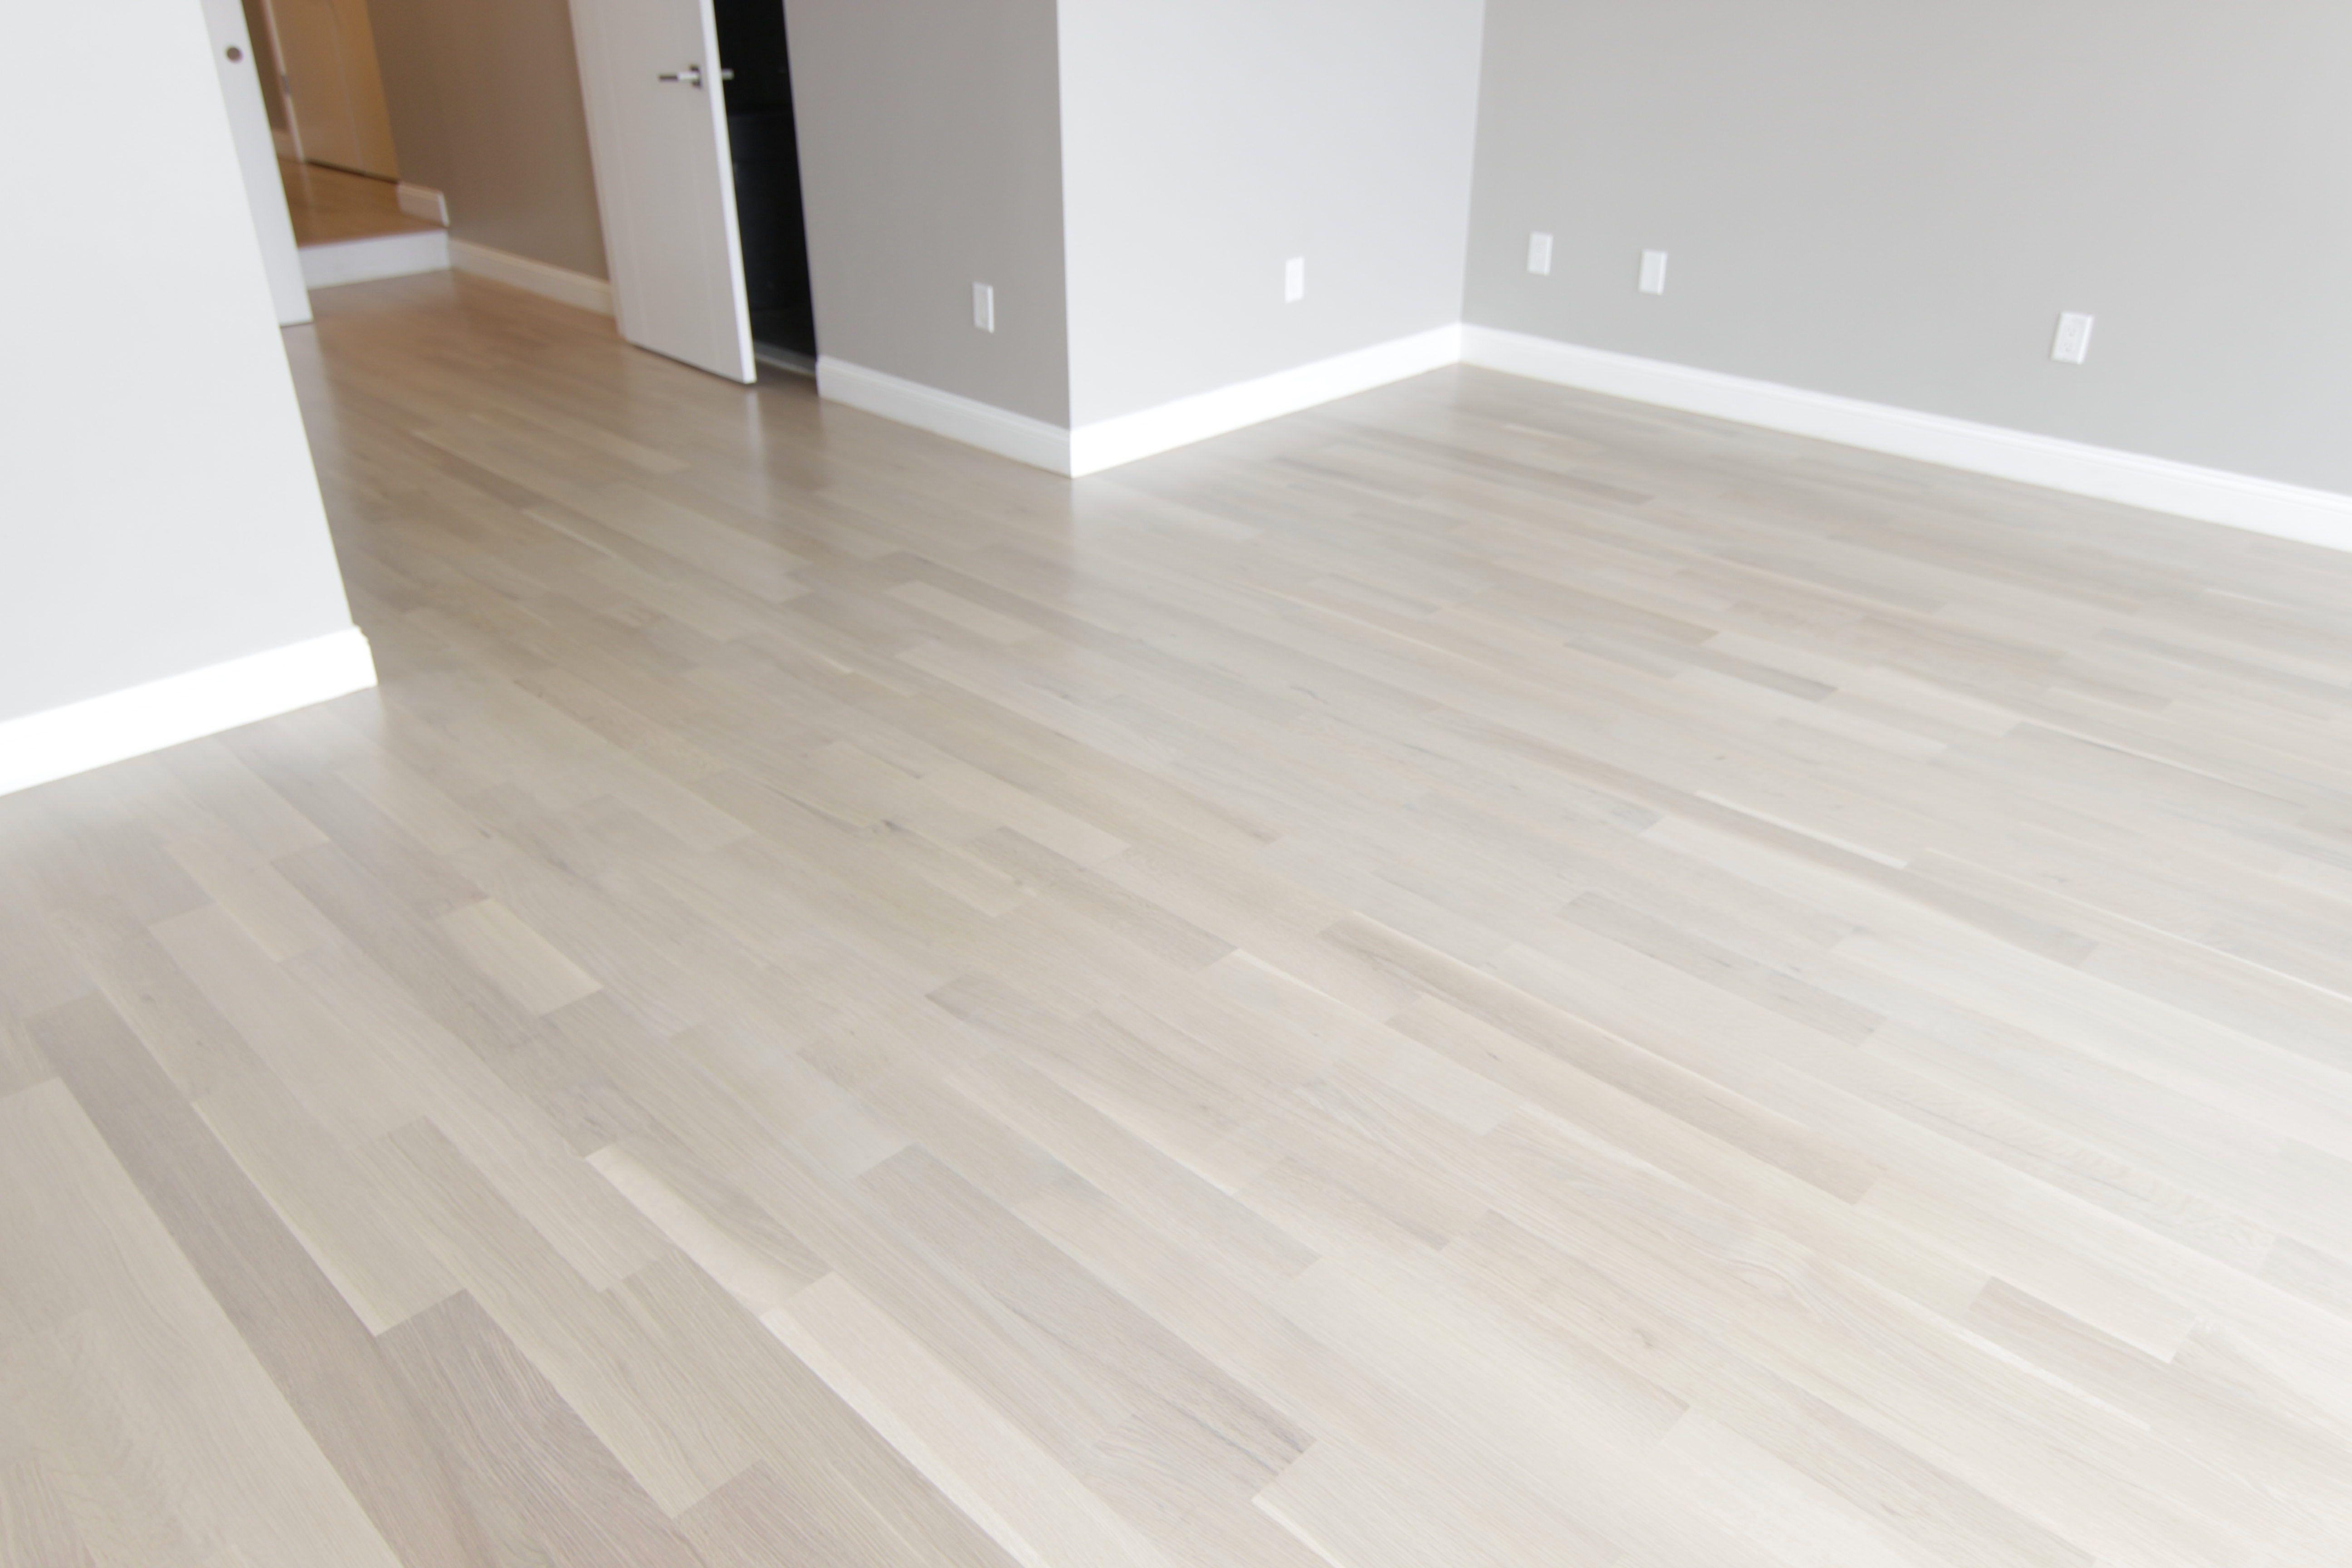 Wood Floor Stain Gandswoodfloors Whitewashed Hardwood Flooring